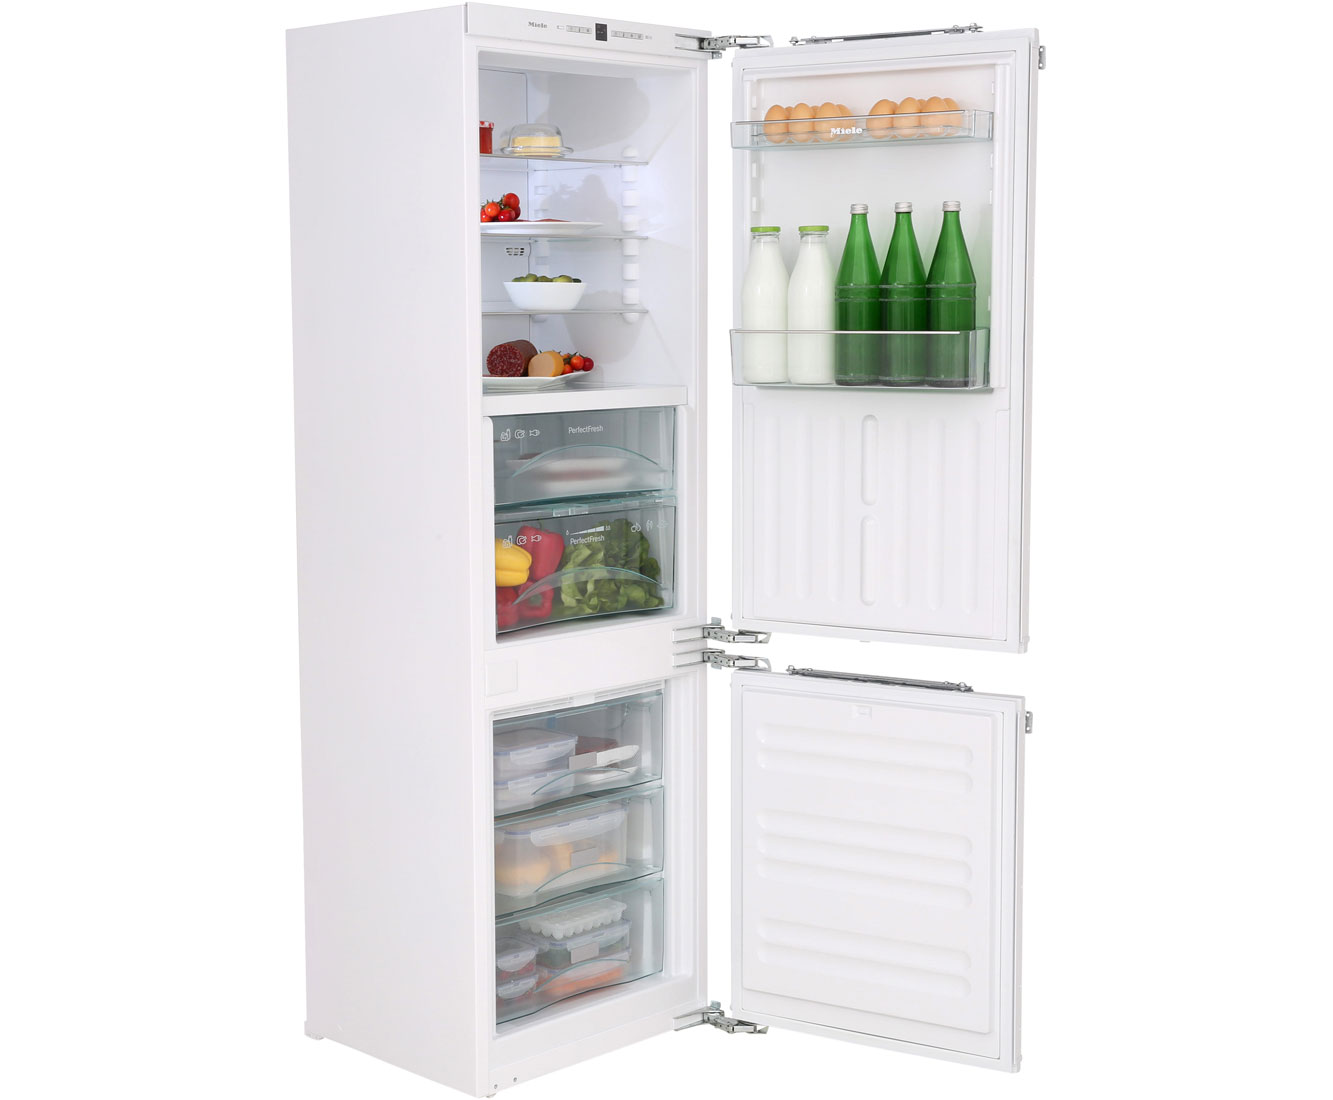 Retro Kühlschrank Miele : Kühl gefrierkombi günstig kühlschrank günstig im check24